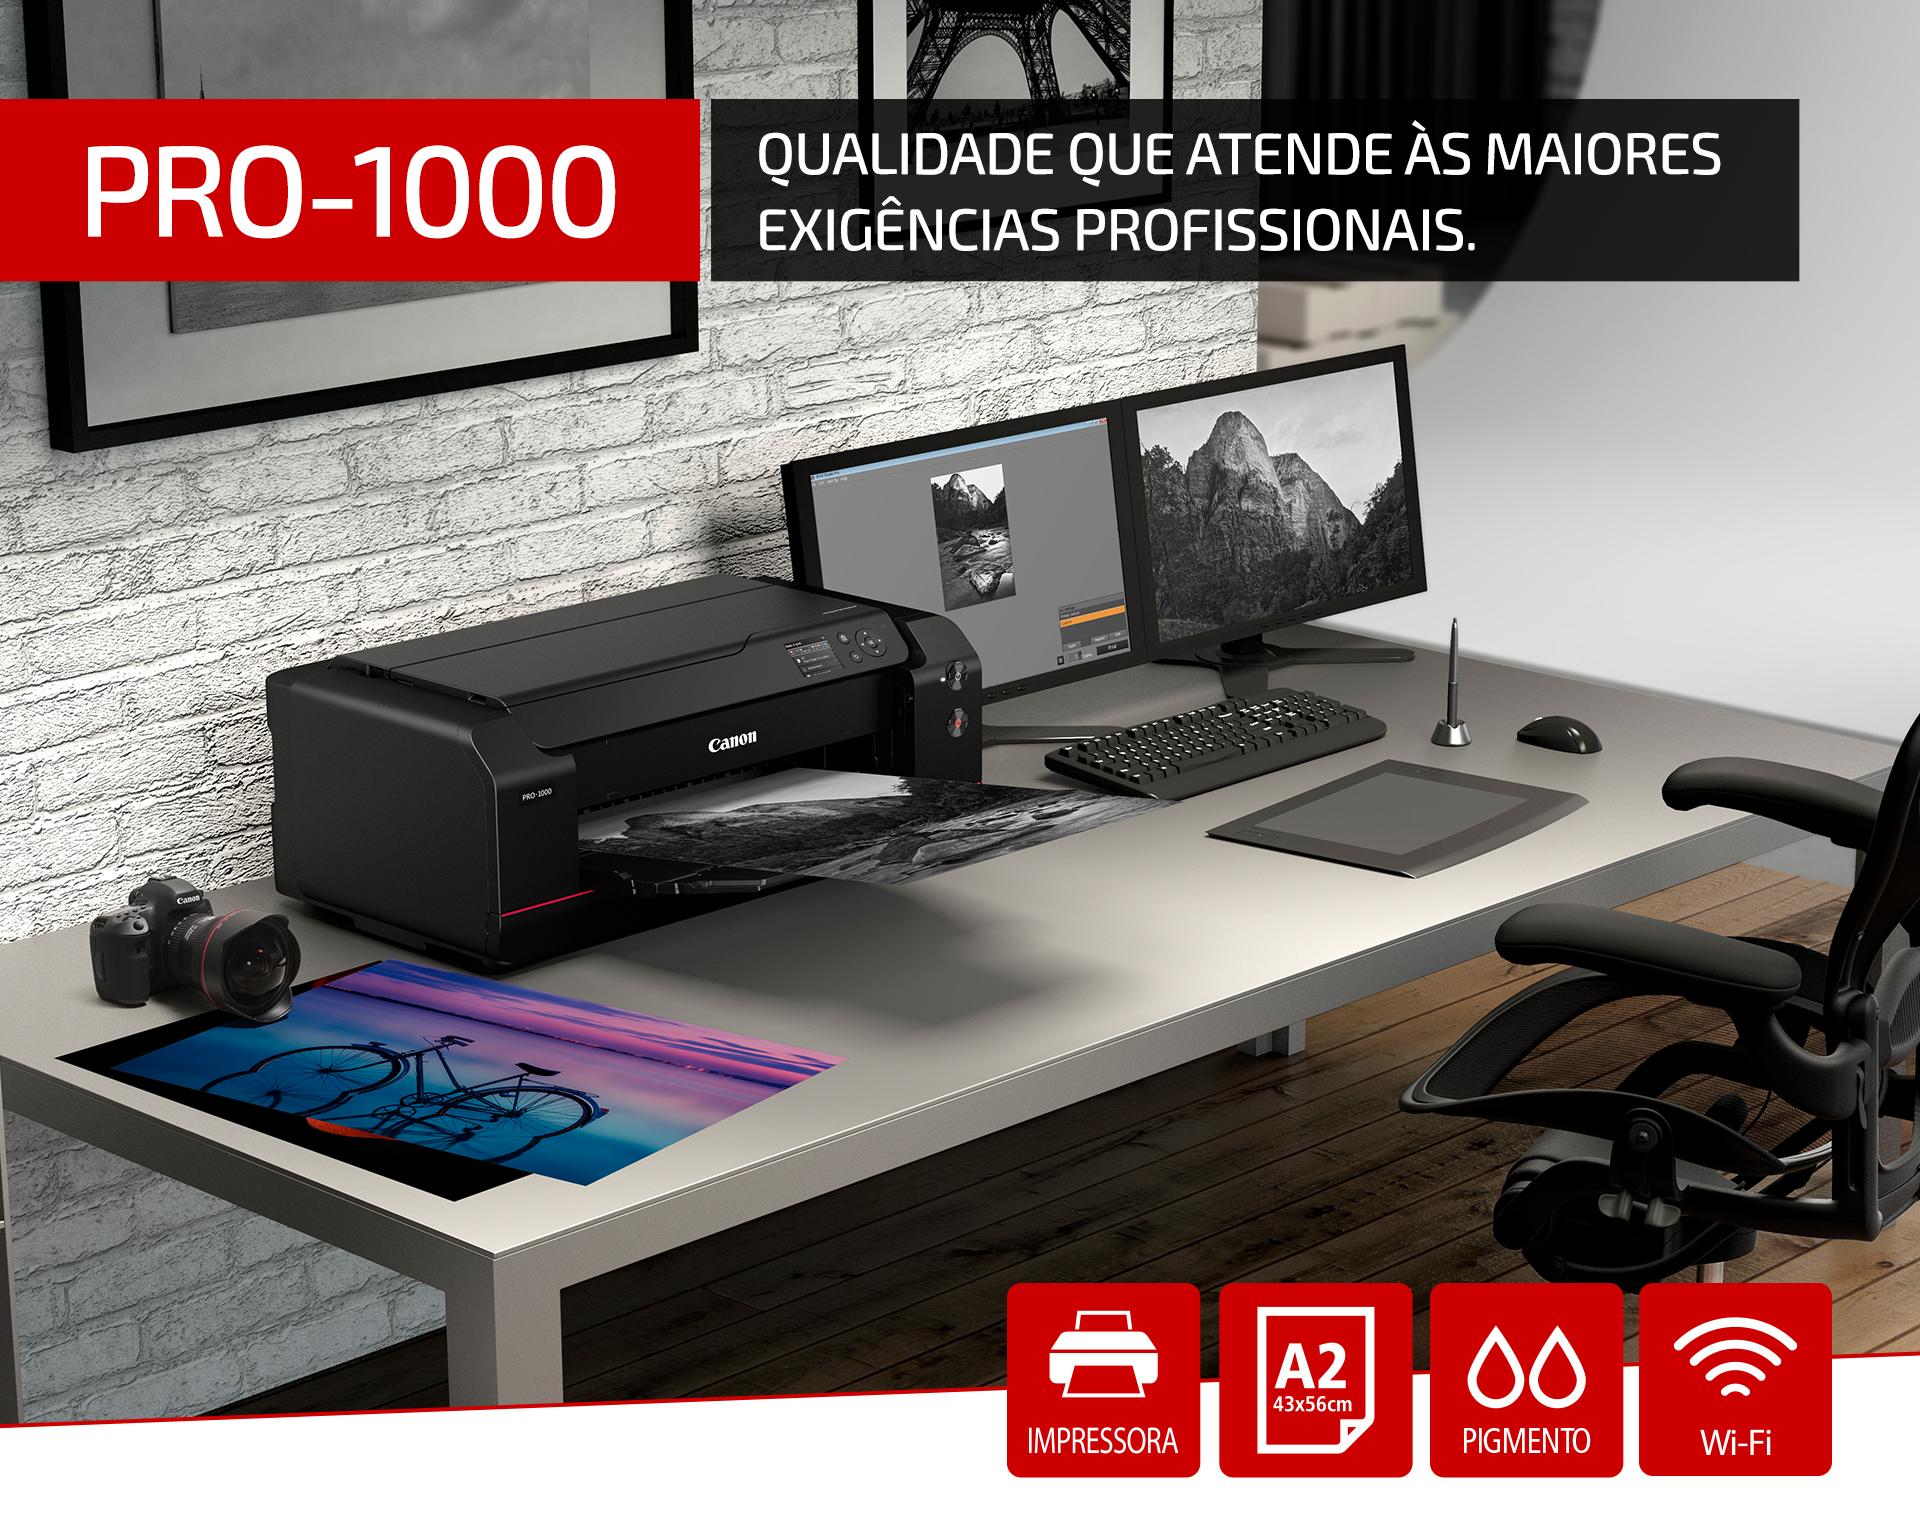 Impressora Fotográfica Jato de Tinta PRO-1000 A2